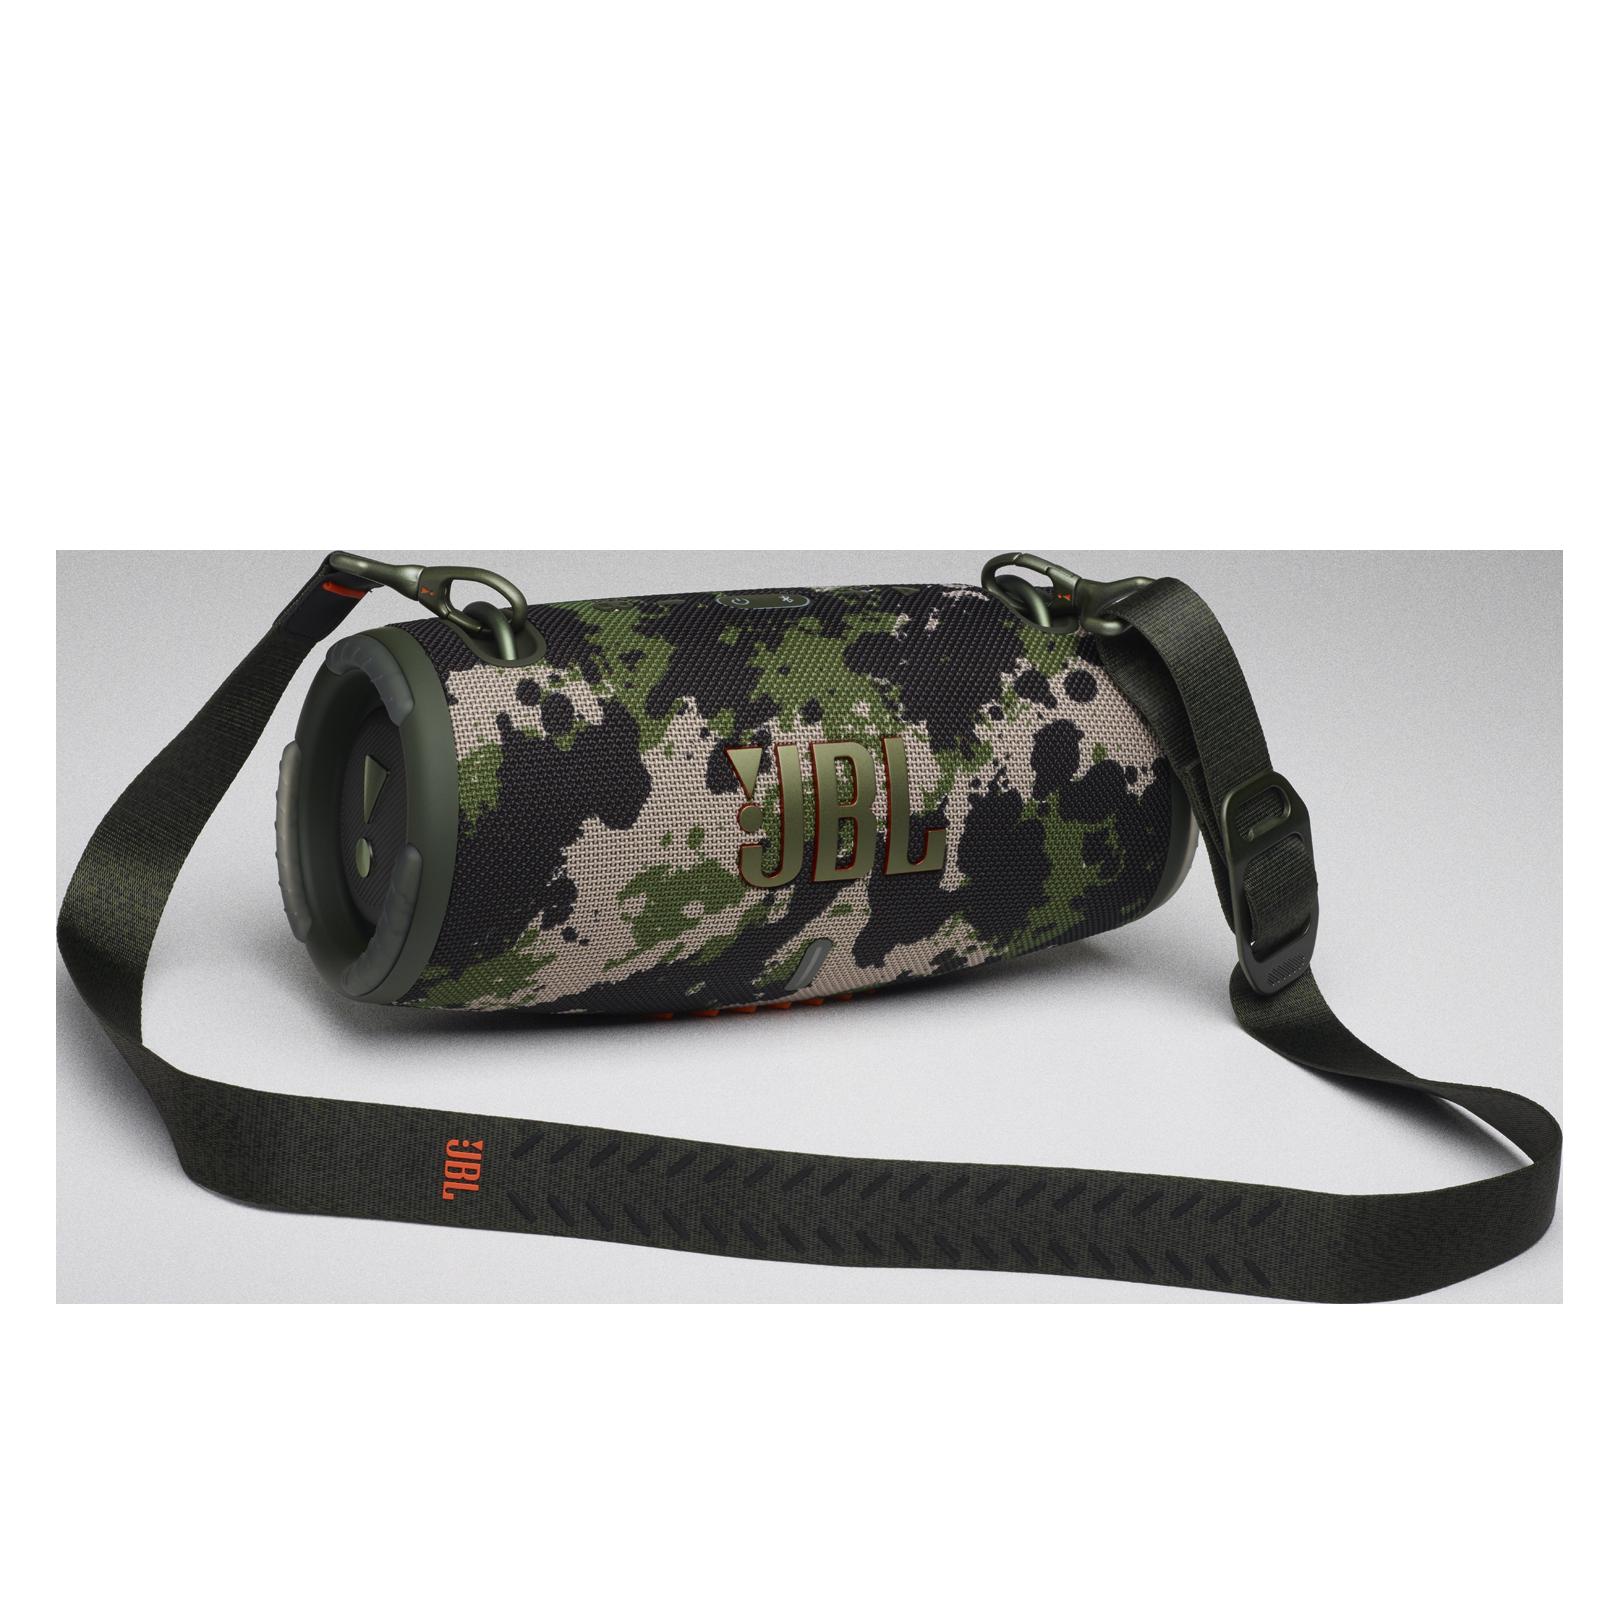 JBL Xtreme 3 - Black Camo - Portable waterproof speaker - Hero